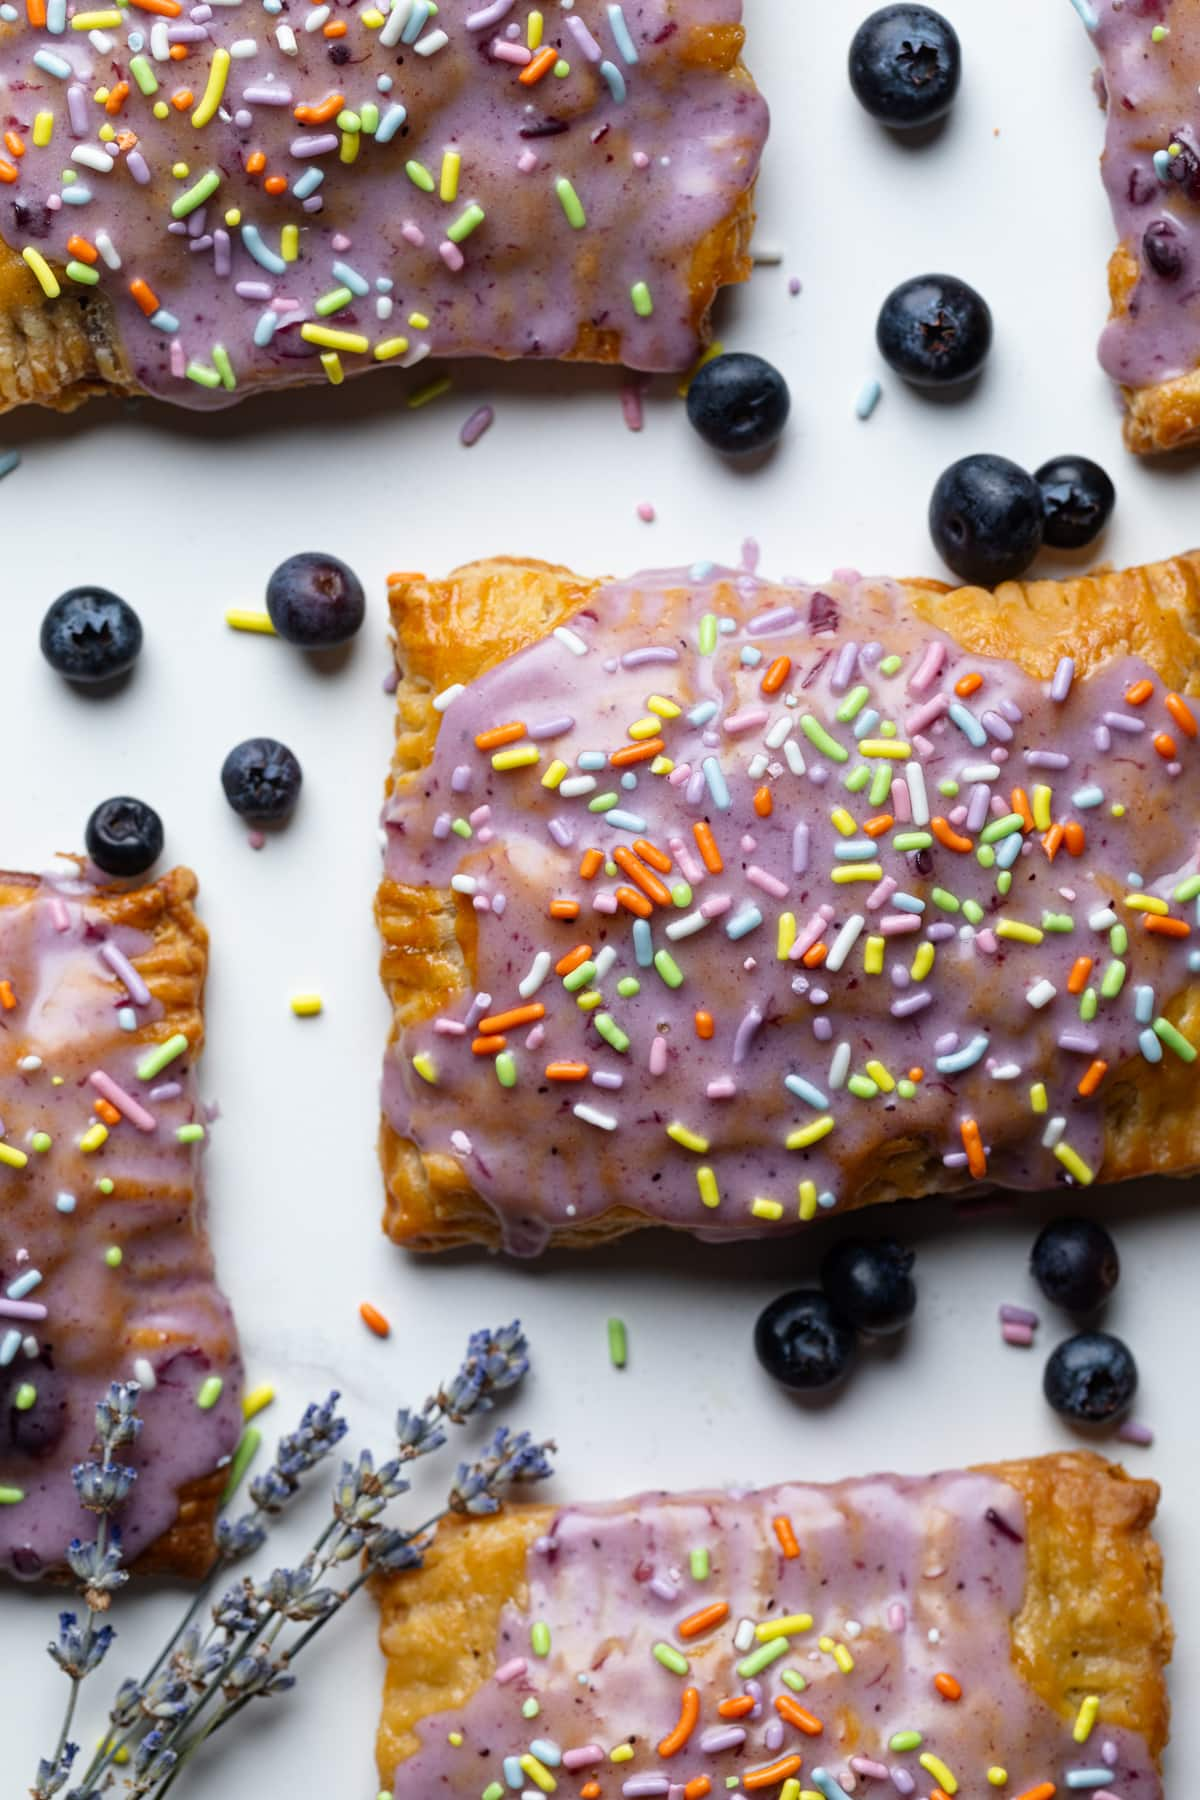 Homemade Blueberry Vegan Pop Tarts